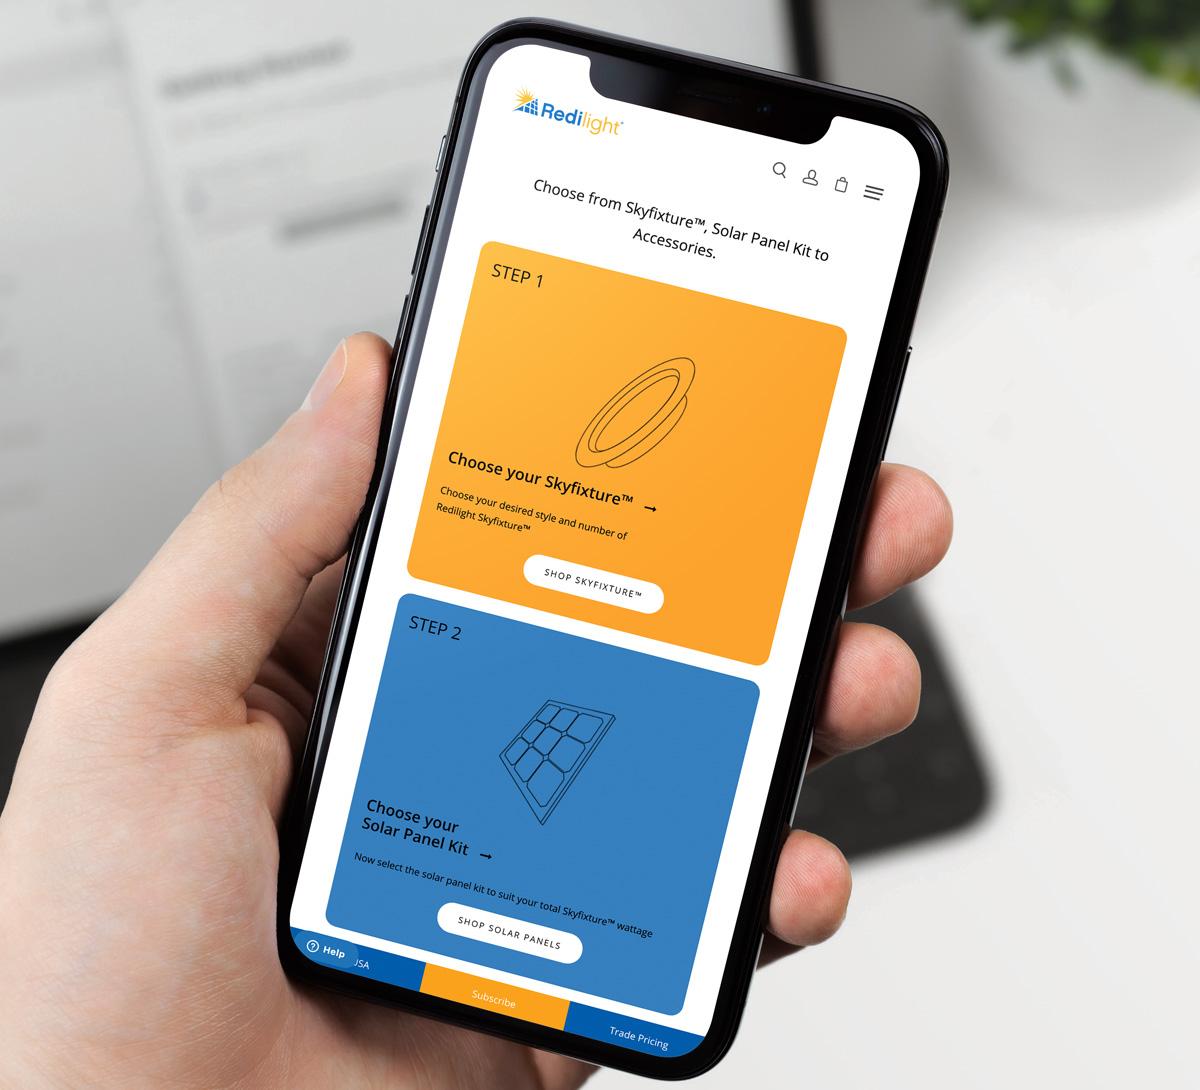 Redilight Website on Mobile